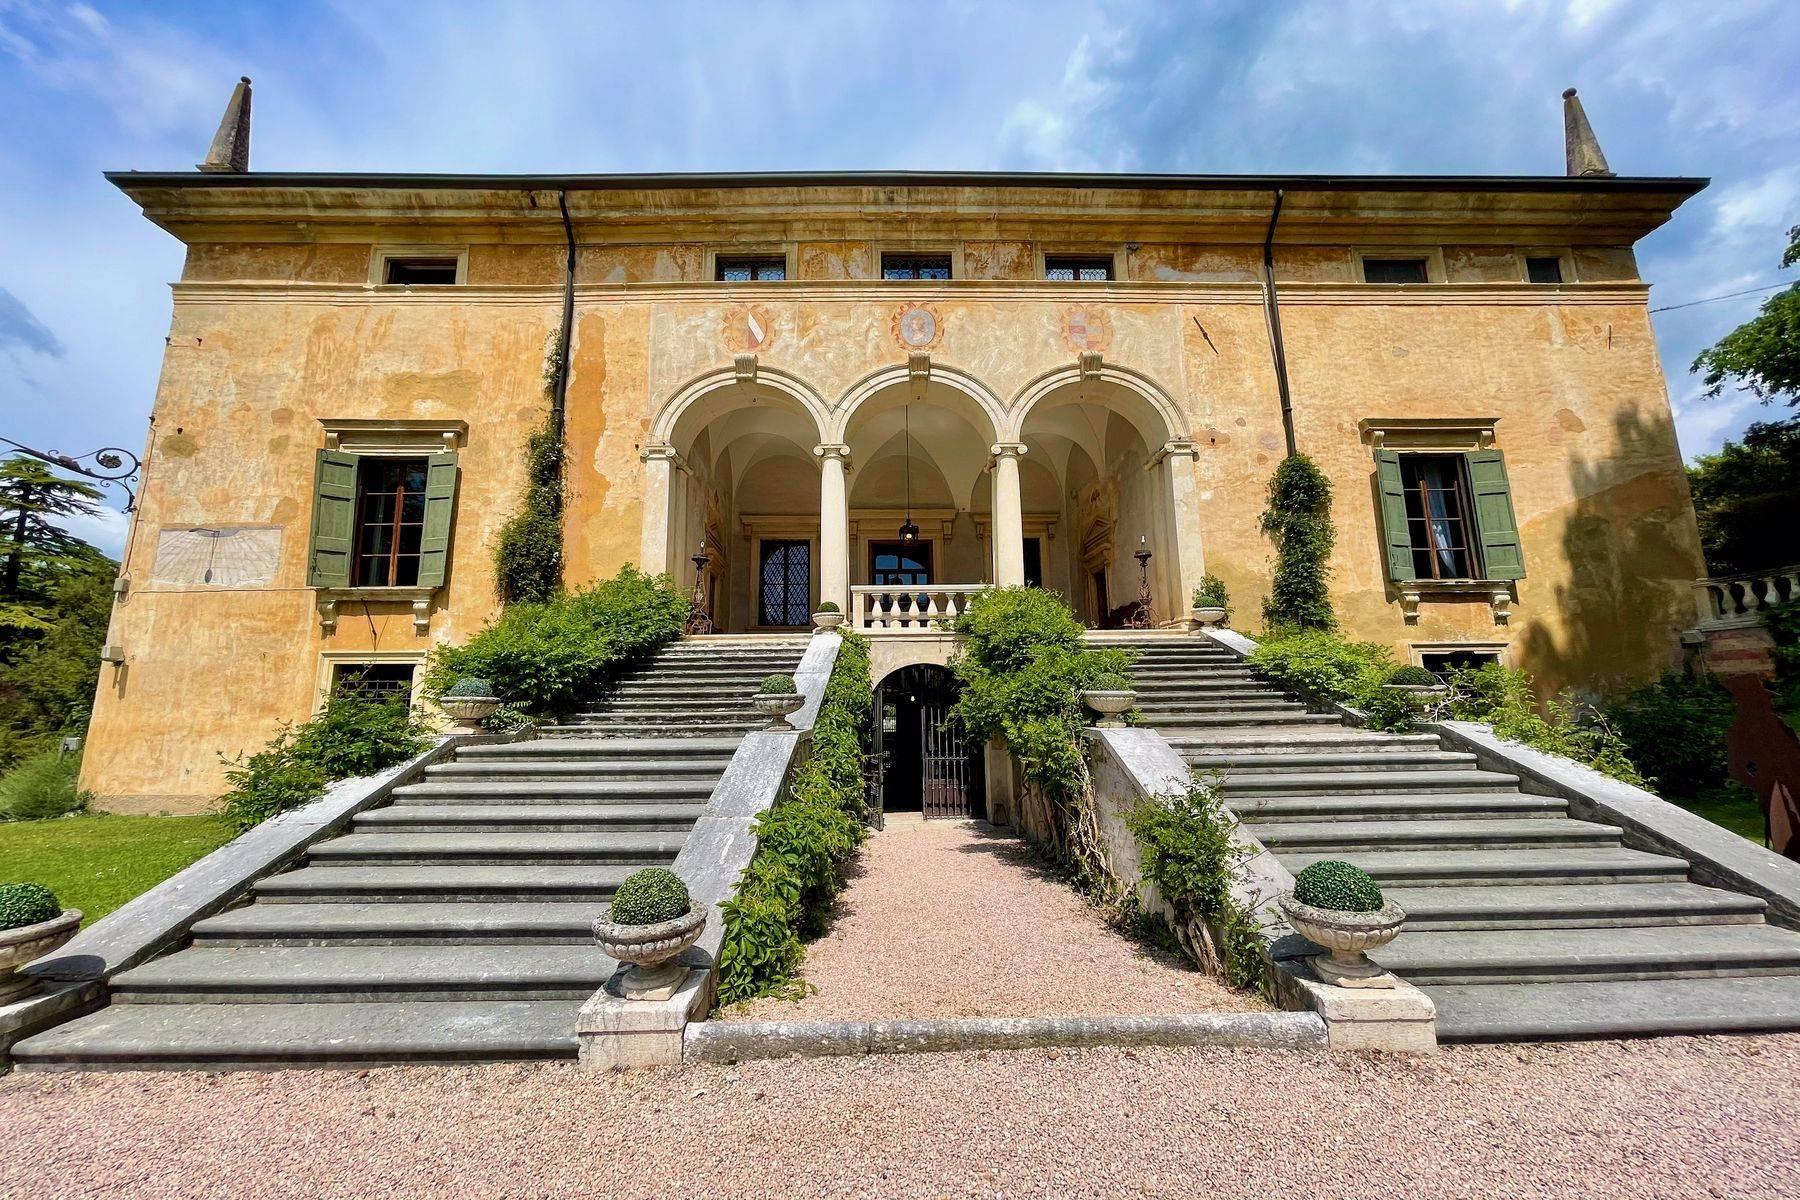 Affascinante villa Veneta a pochi minuti da Verona - 41